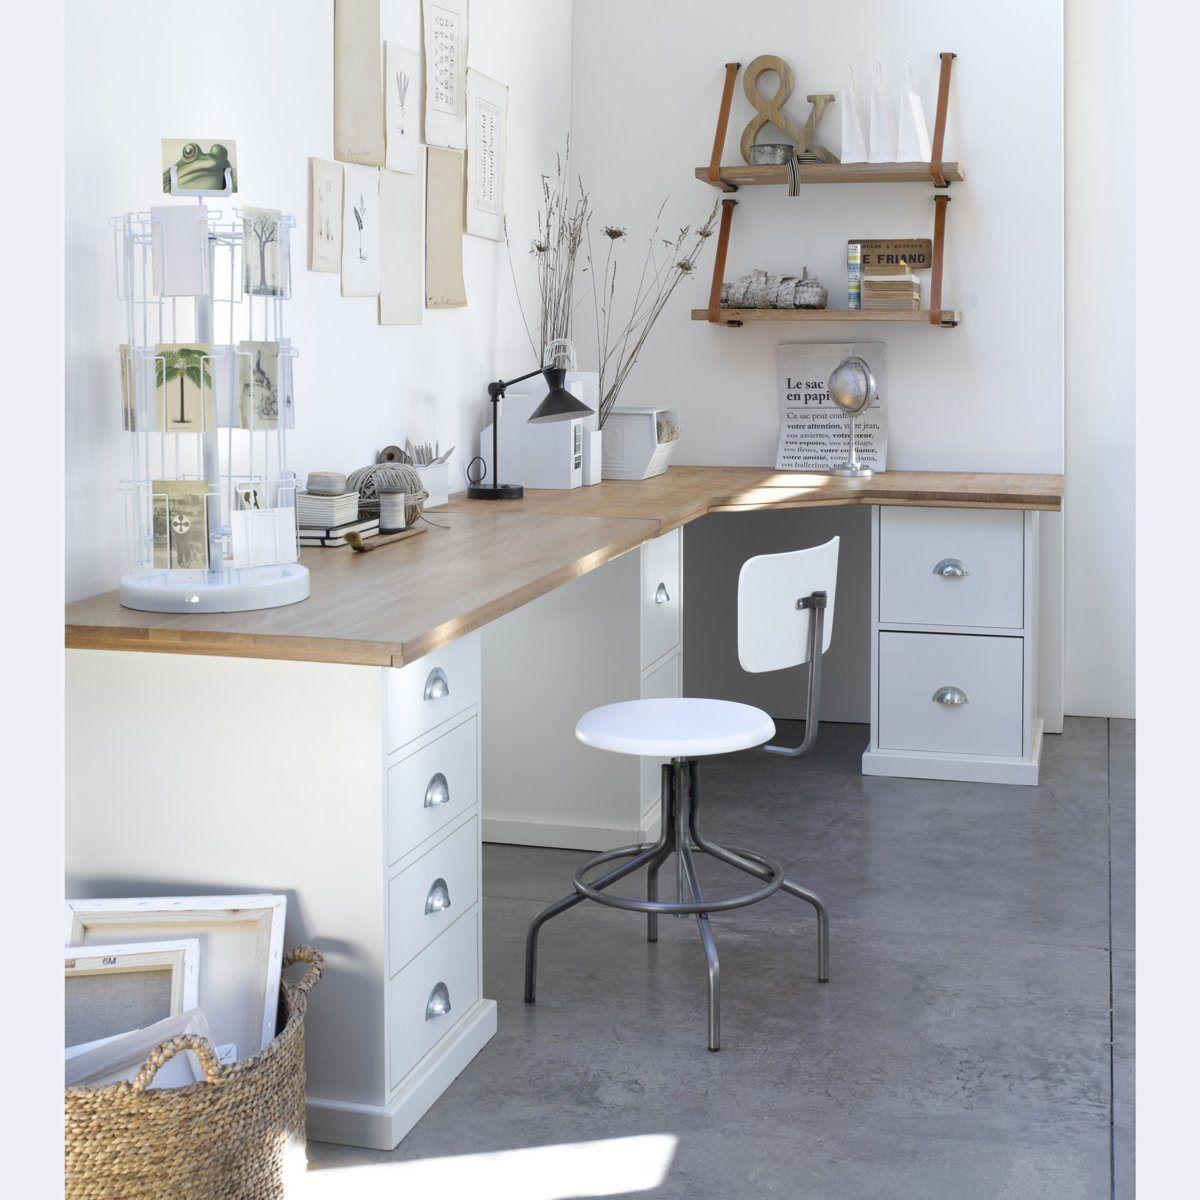 plateau d 39 angle pin tanguy am pm la redoute mobile home sweet home pinterest bureau. Black Bedroom Furniture Sets. Home Design Ideas